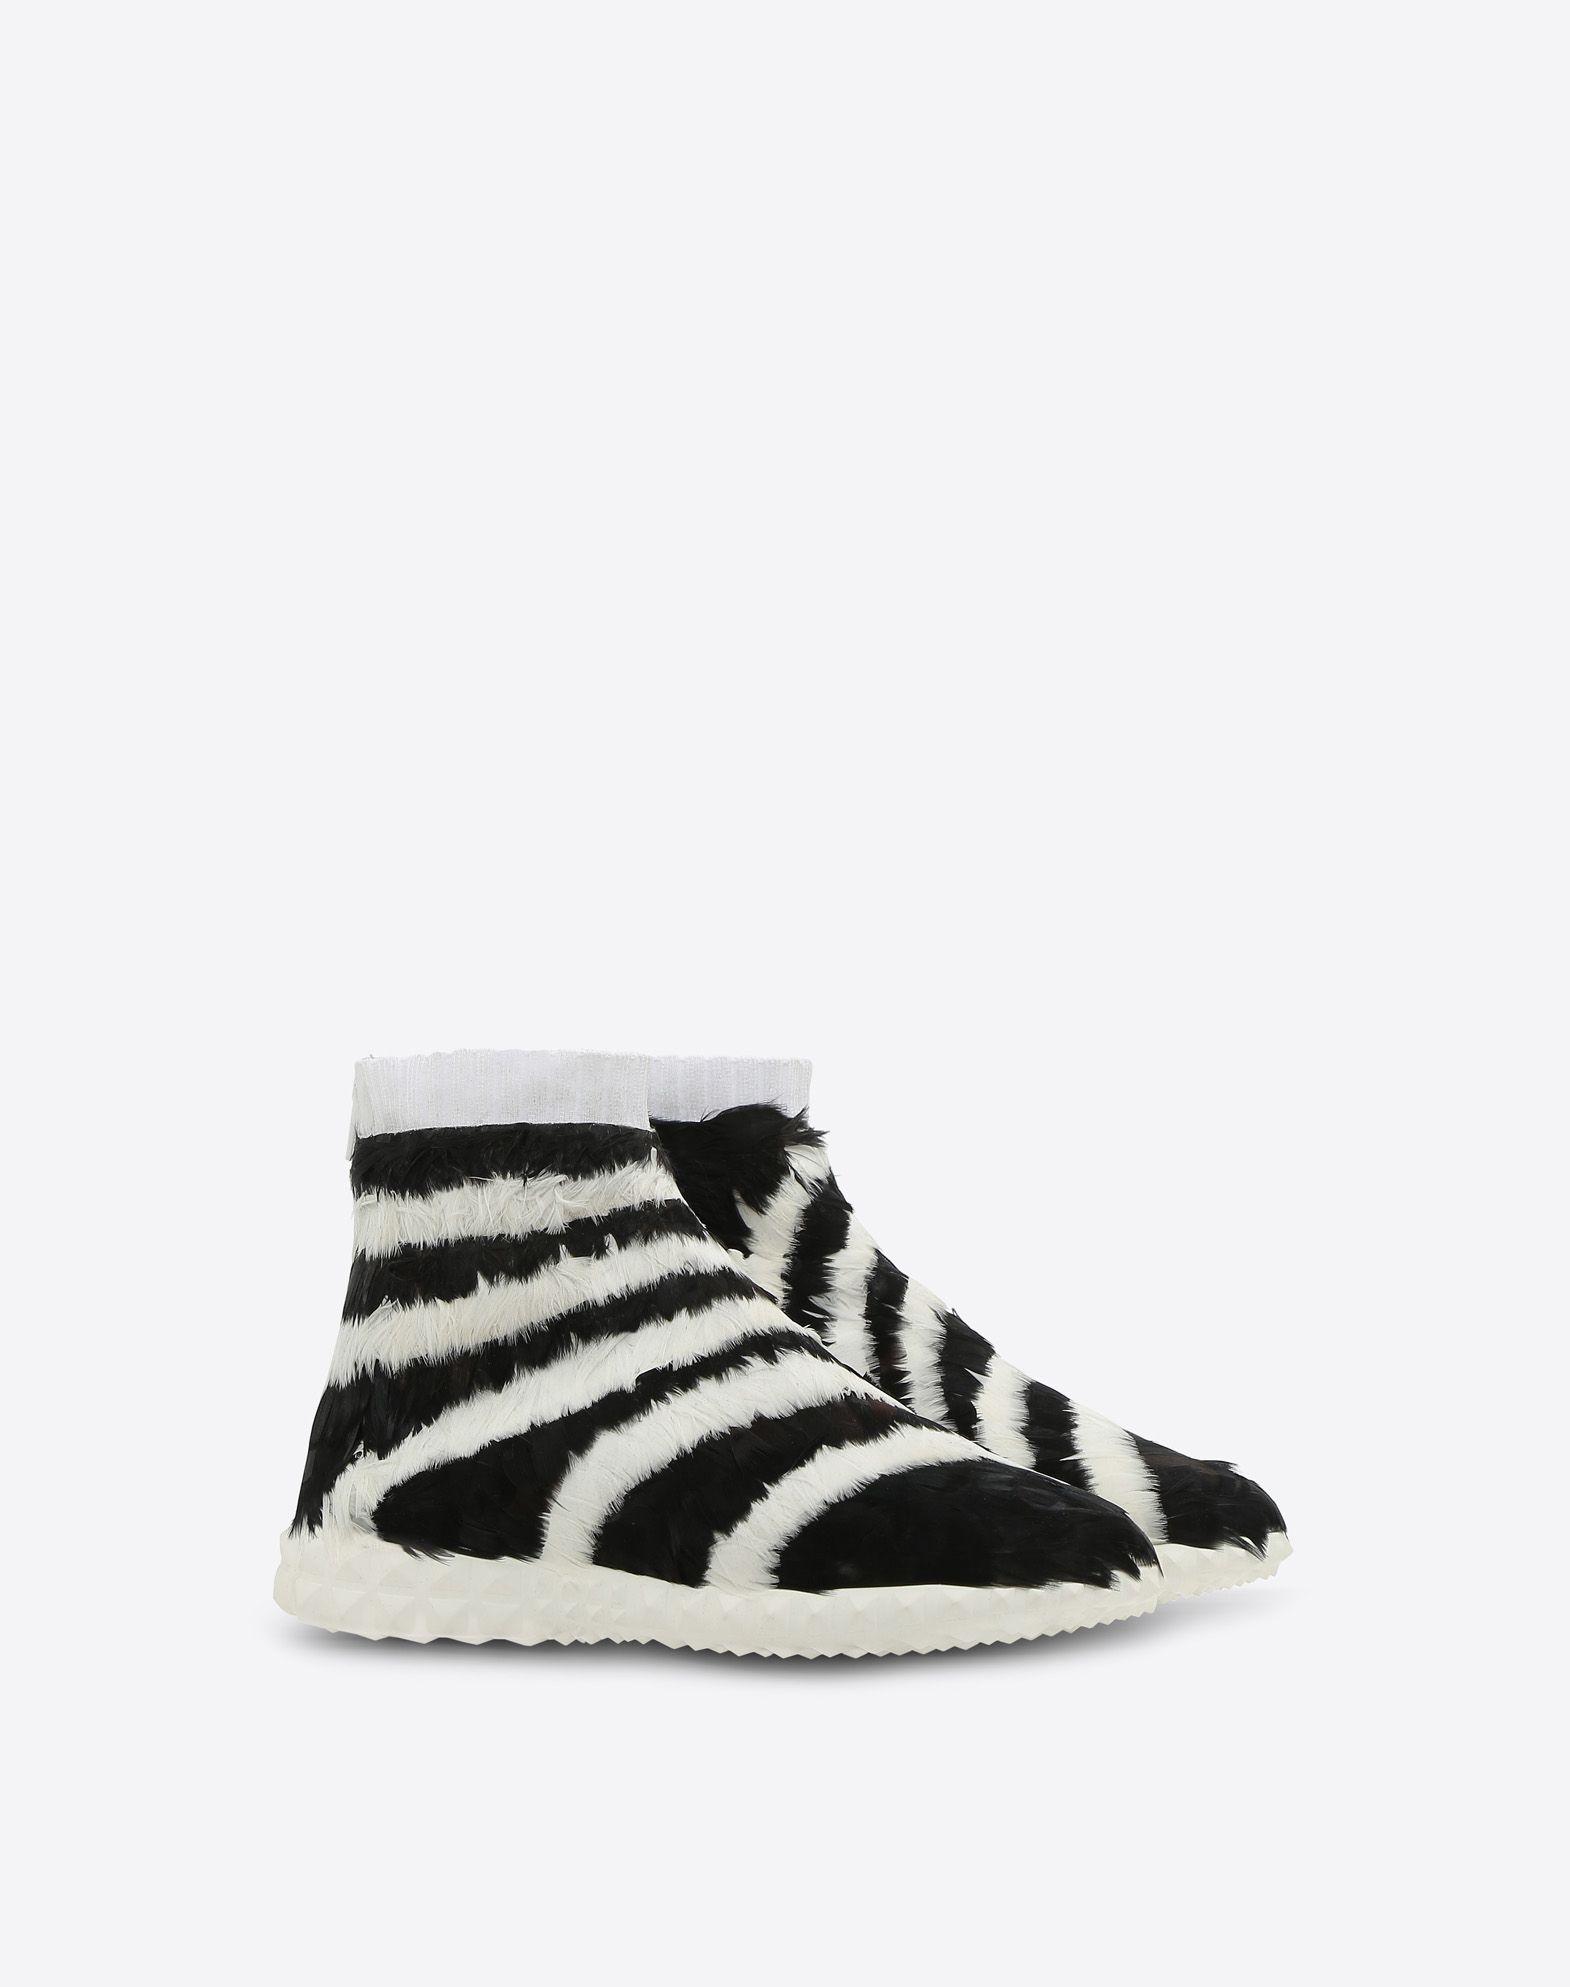 VALENTINO GARAVANI Sneakers con plumas SNEAKERS ALTAS D r